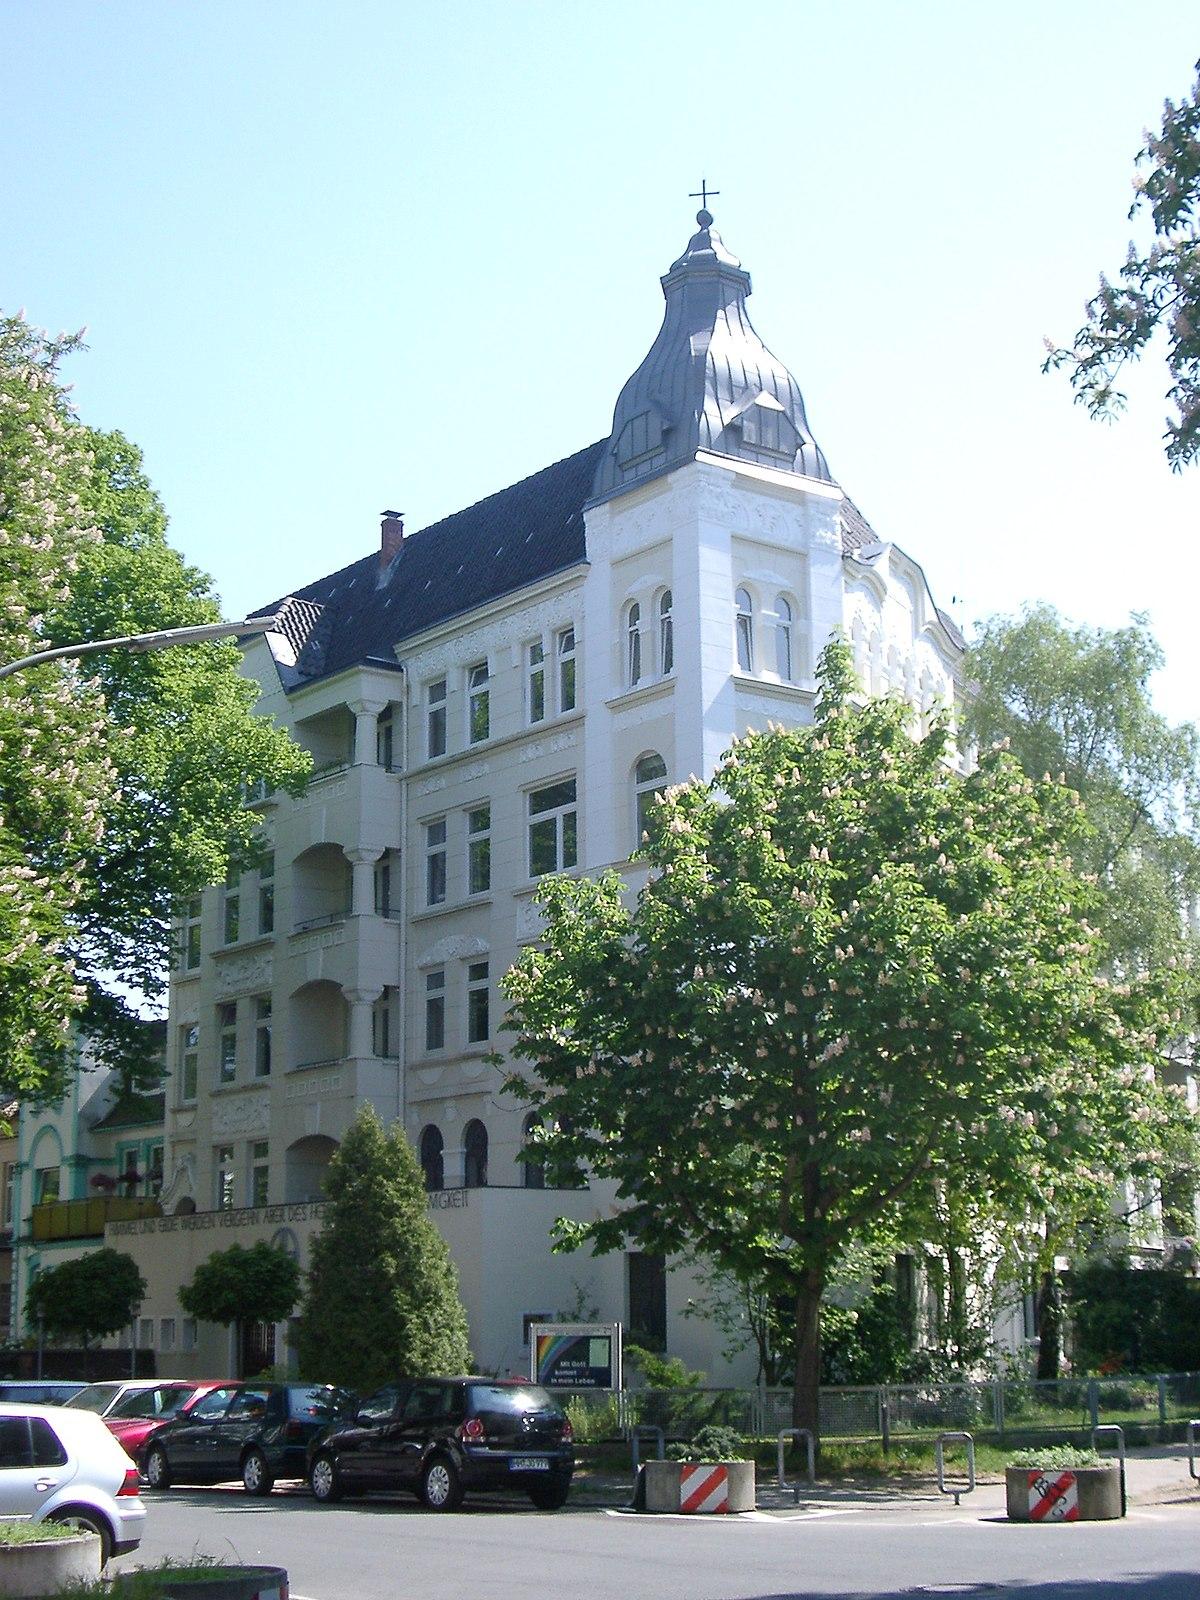 Hamburg Hoheluft